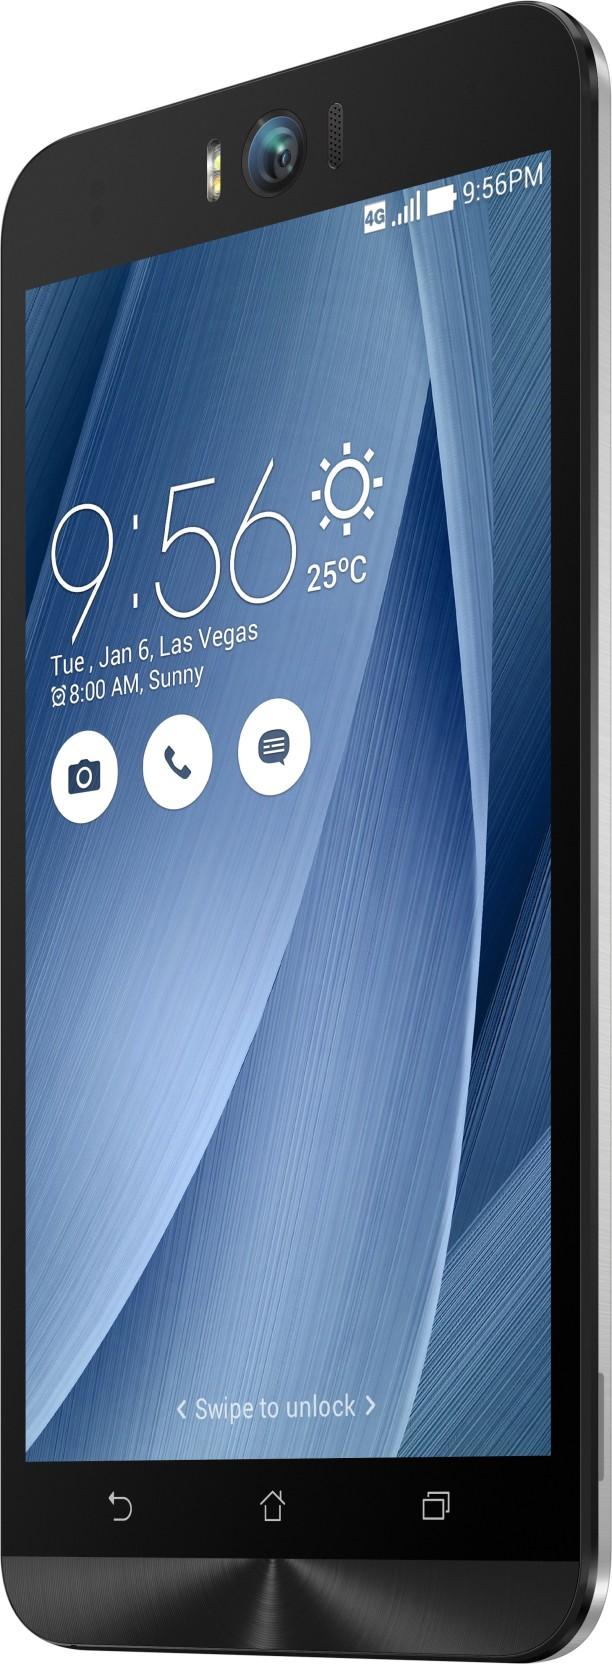 Asus Zenfone Selfie (Silver, 16 GB)(3 GB RAM) for ₹11,499 at flipkart